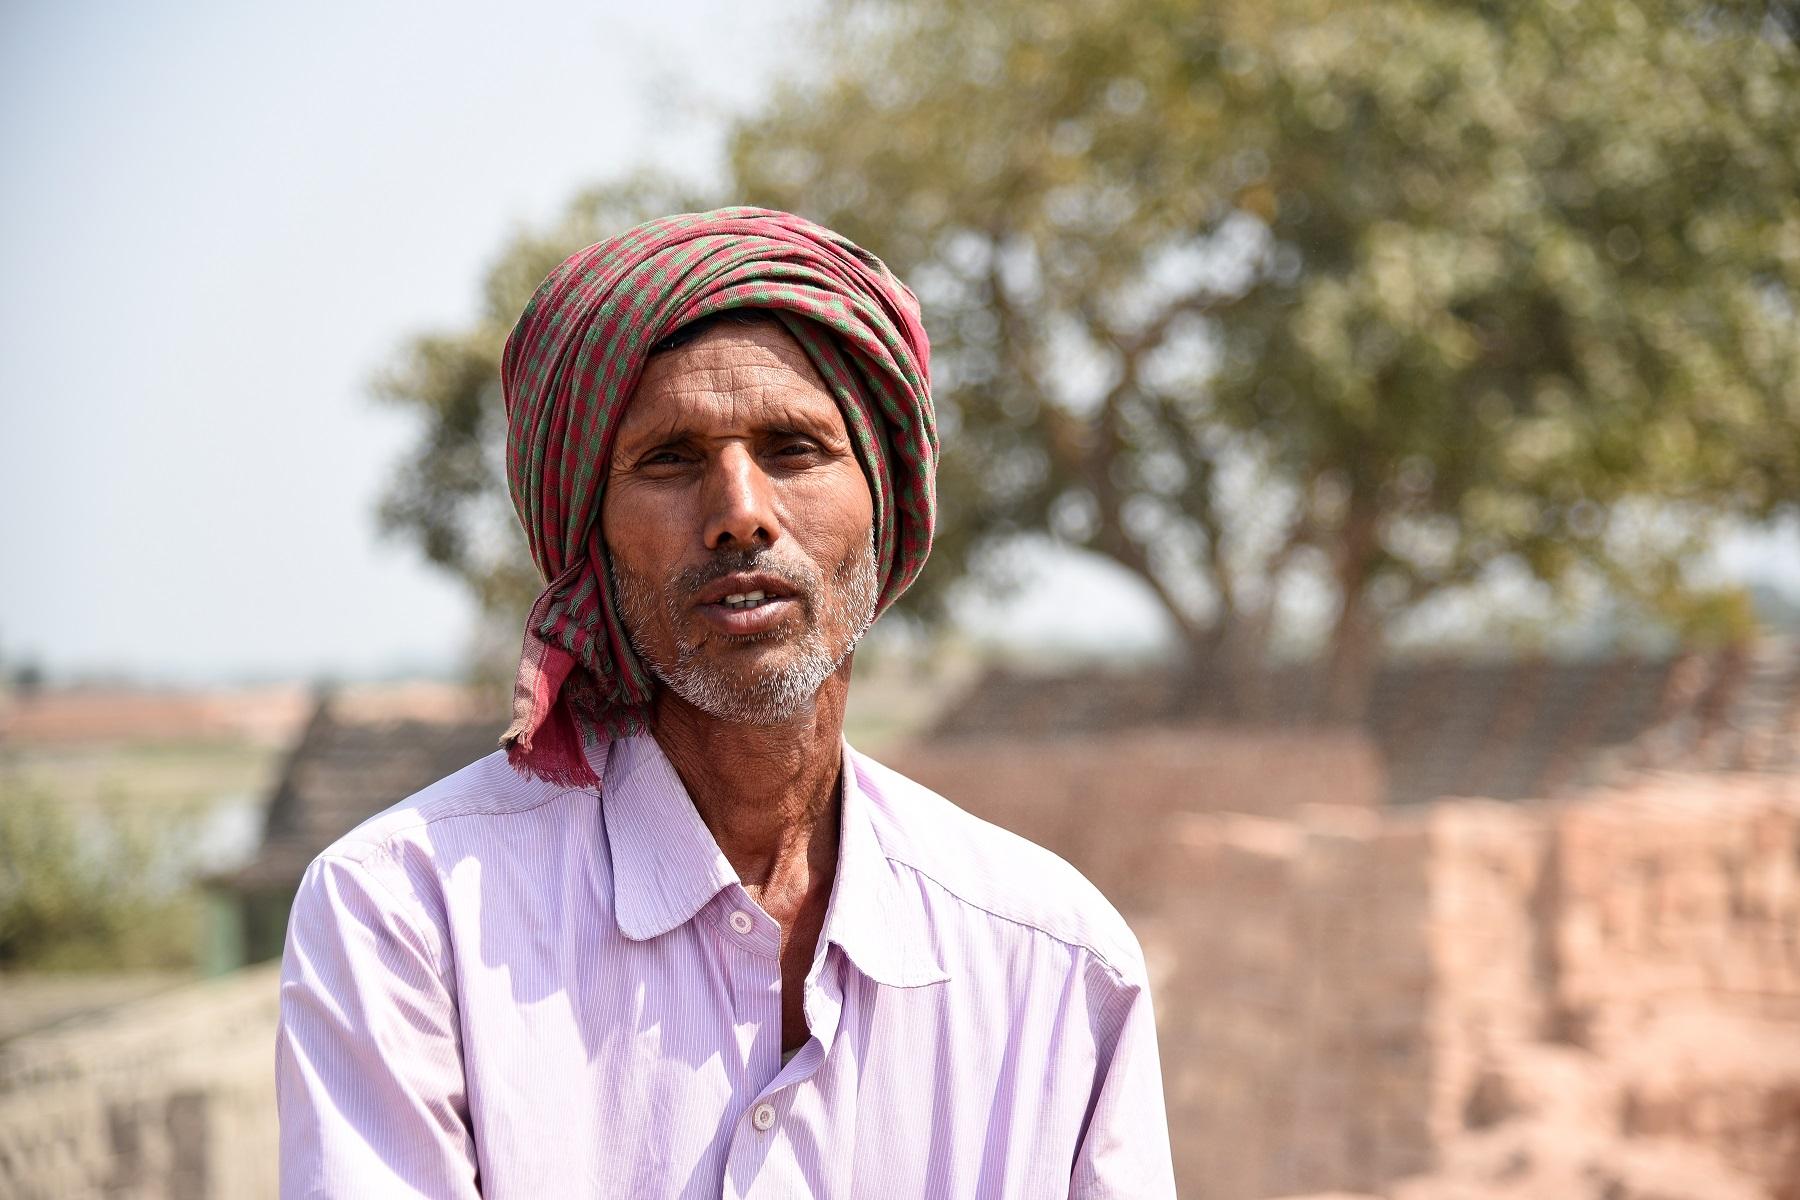 16. Narmu Yadav, from Gazipur, Uttar Pradesh